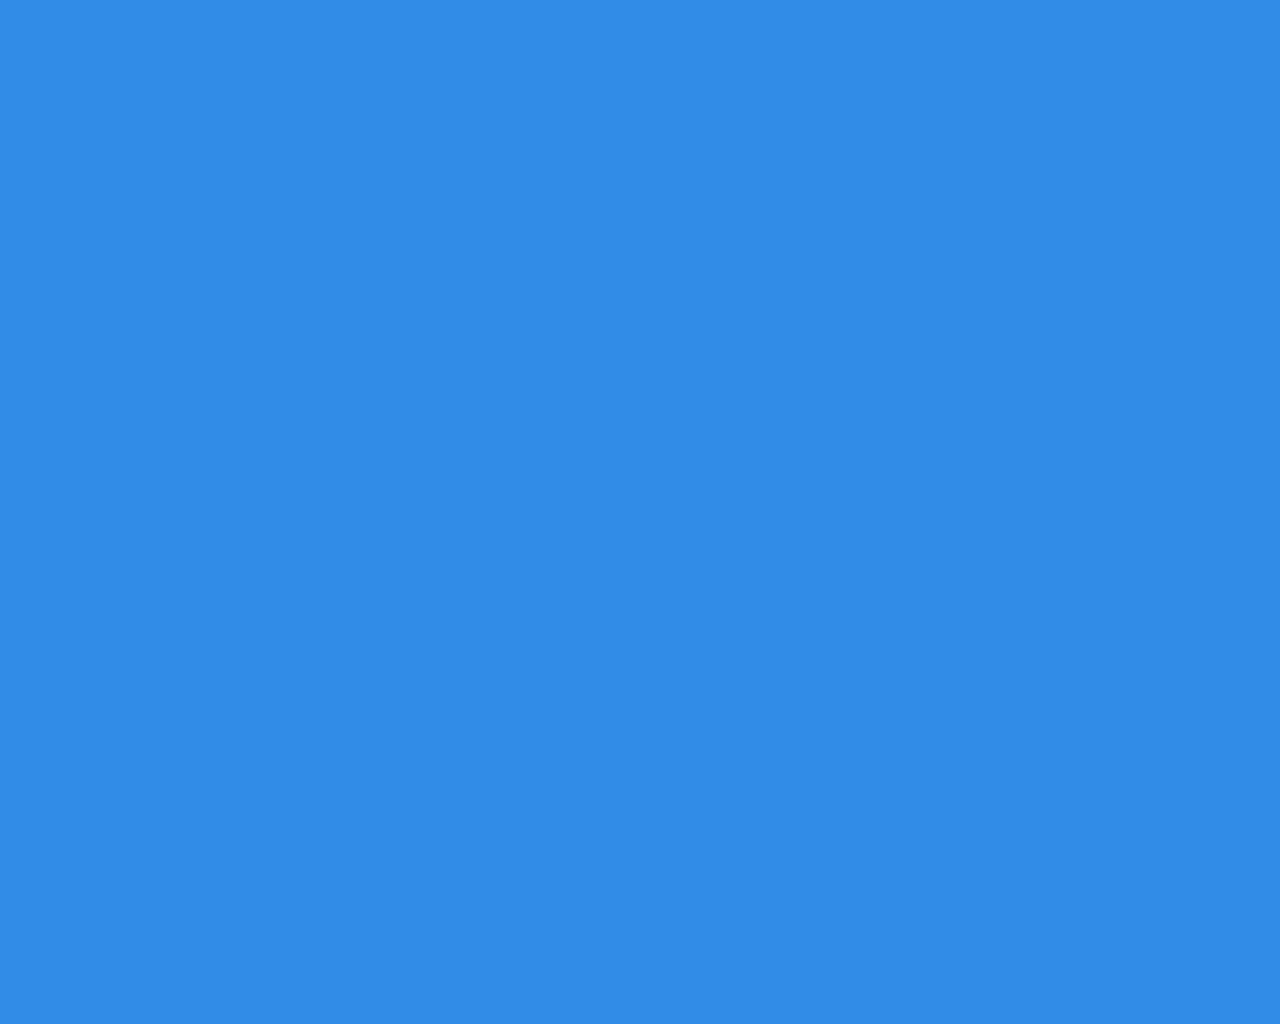 1280x1024 Bleu De France Solid Color Background